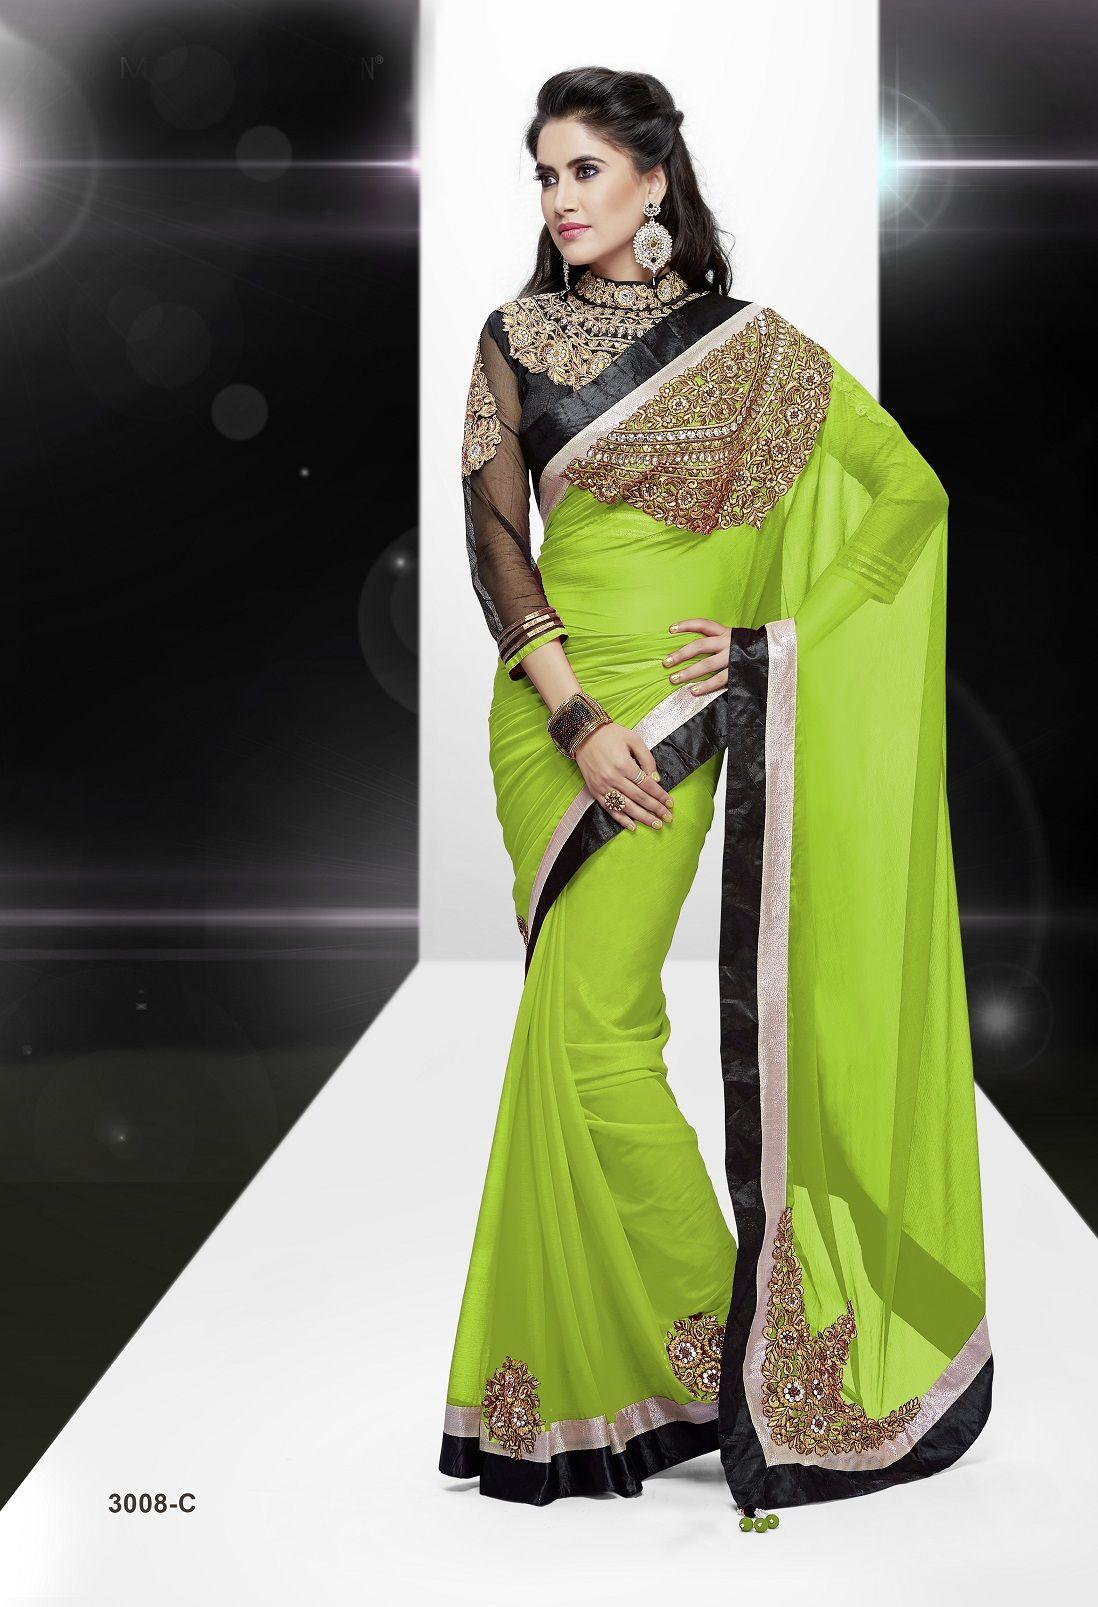 Saree blouse design for chiffon saree atsendshoppinglpfvptesgqfcolorgreen